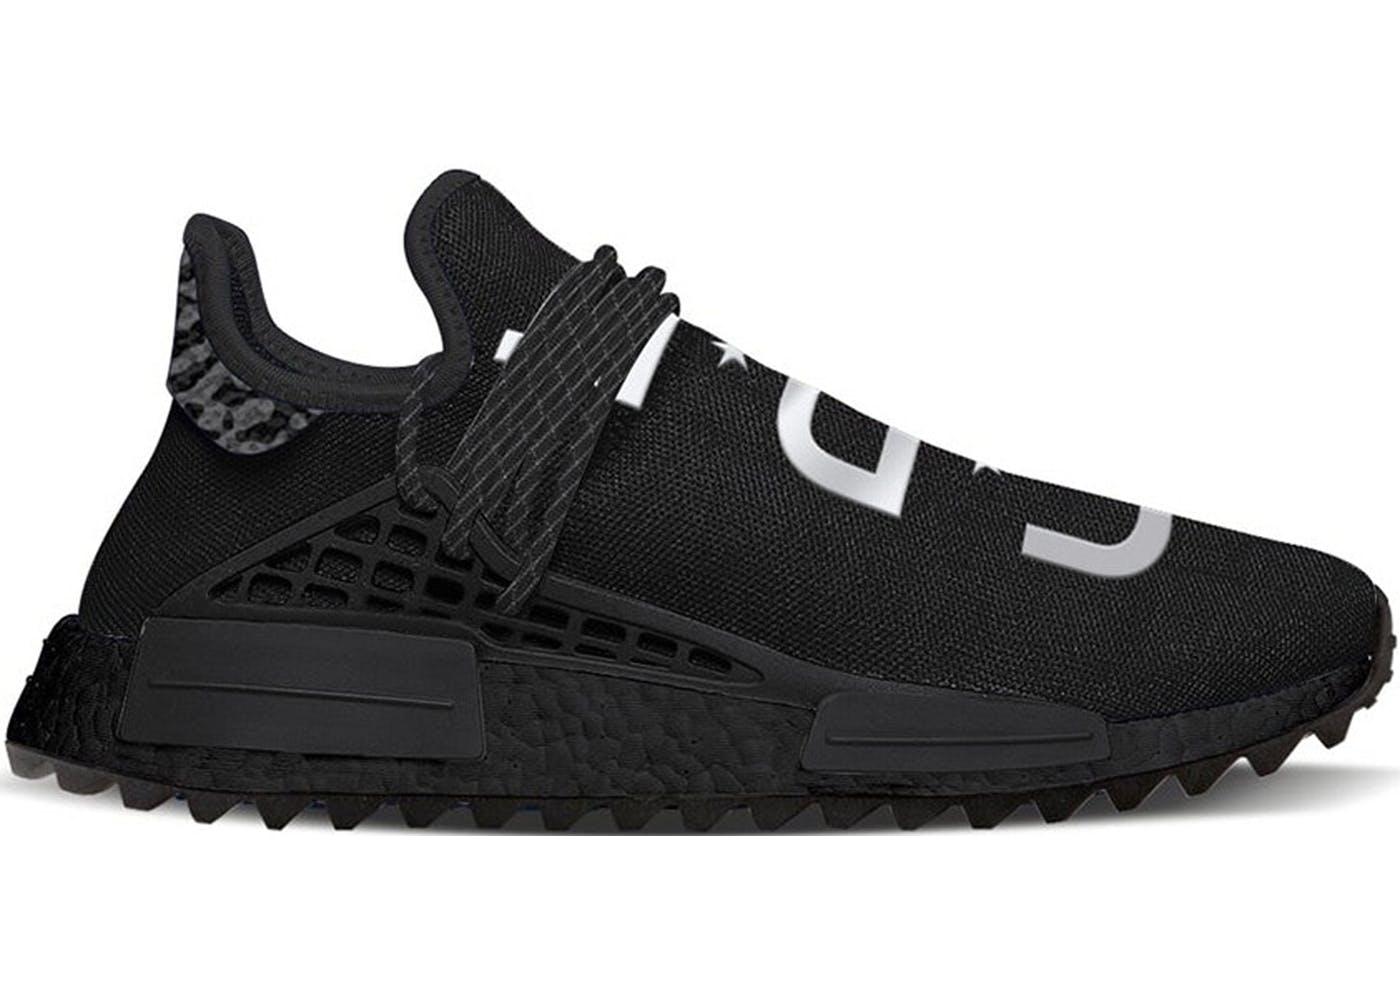 reputable site f61de 7e2ac Adidas Human Race NMD Pharrell You Nerd - StockX News